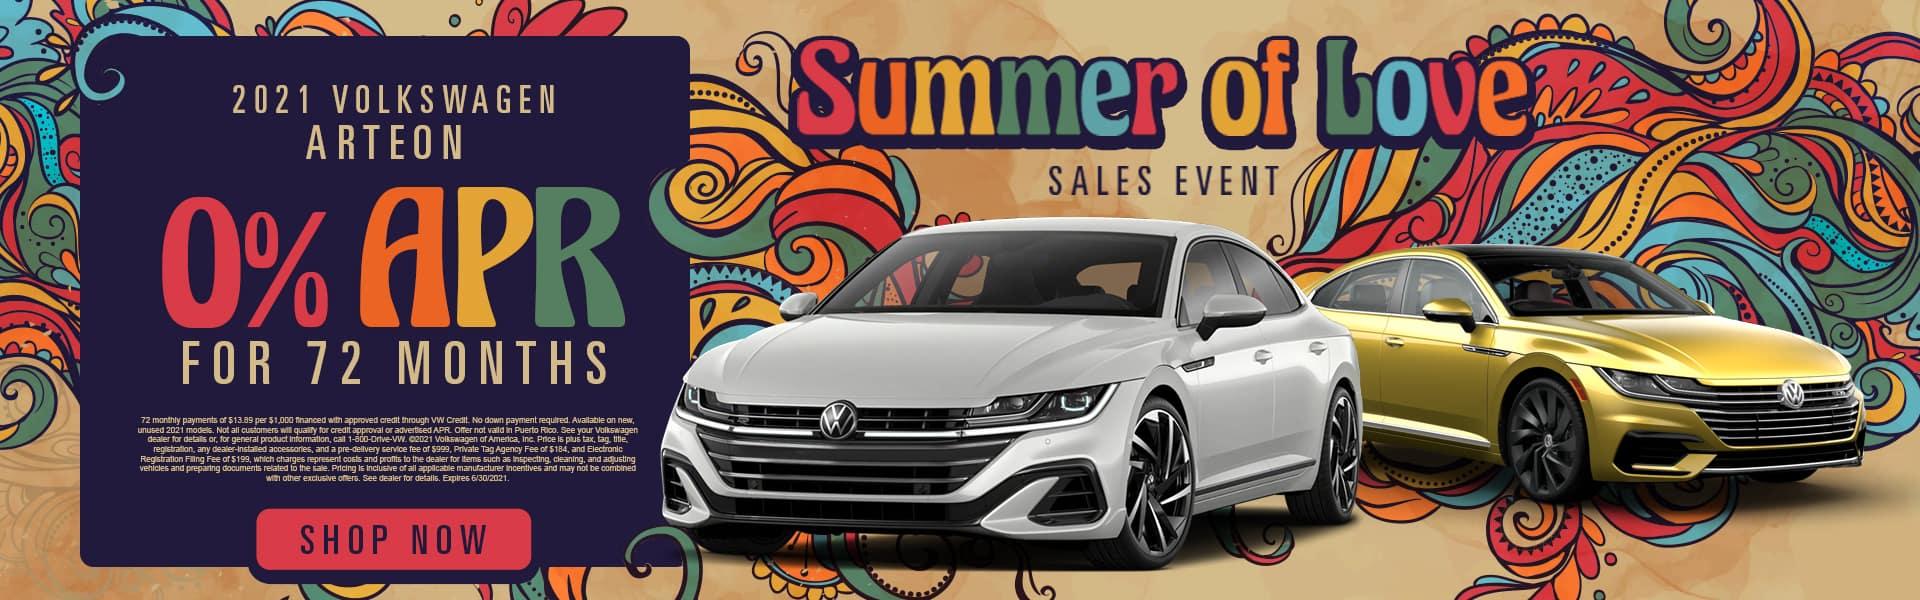 Summer of Love | 2021 Volkswagen Arteon | 0% APR For 72 Months